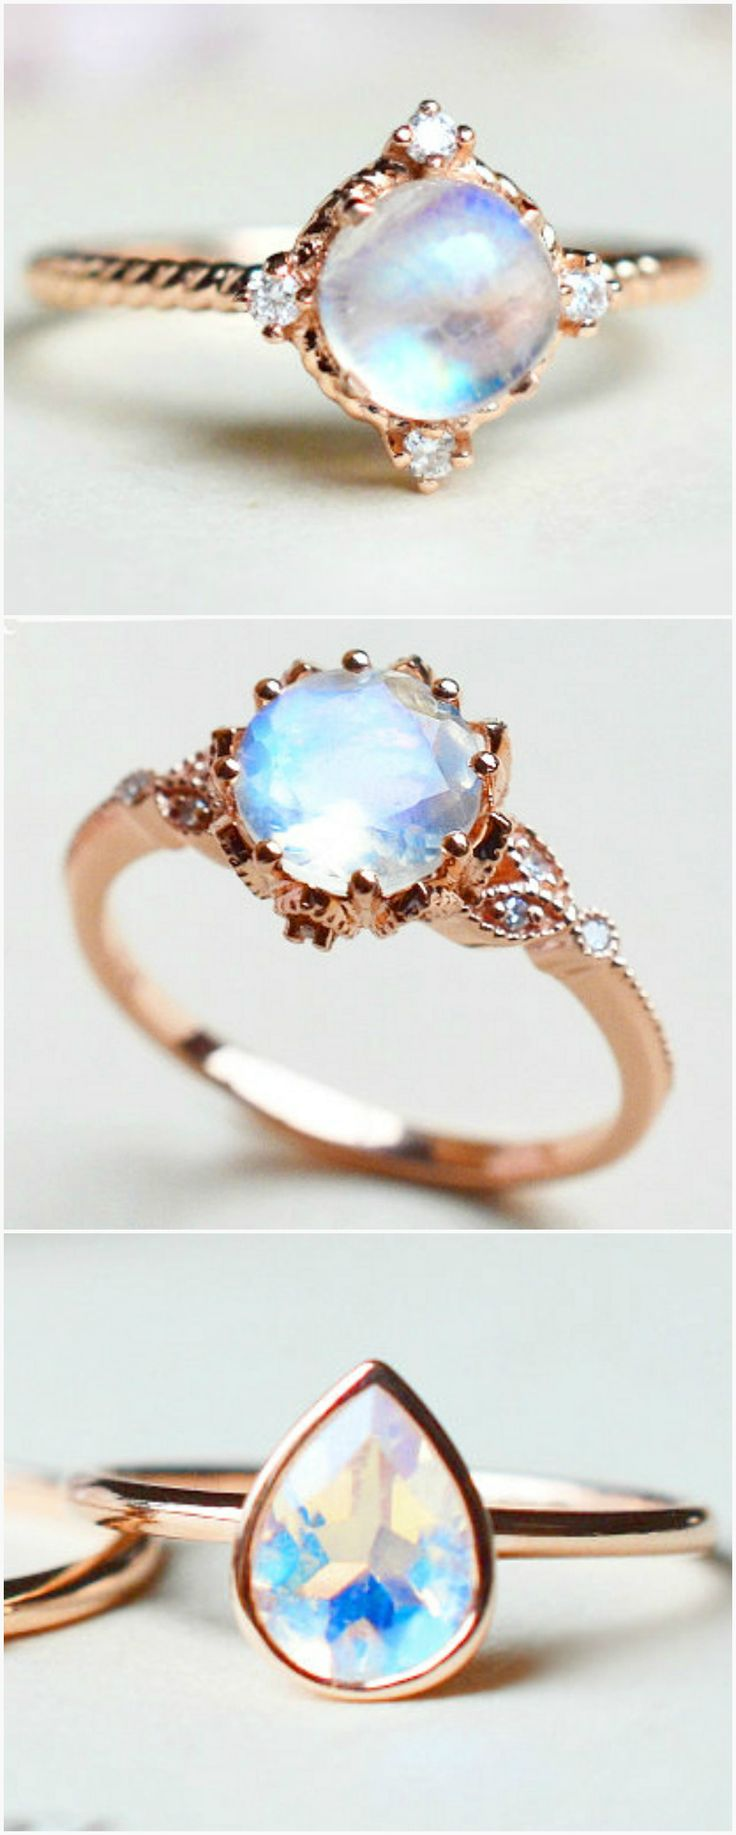 Beautiful Moonstone Engagement Rings   MichelliaDesigns on Etsy